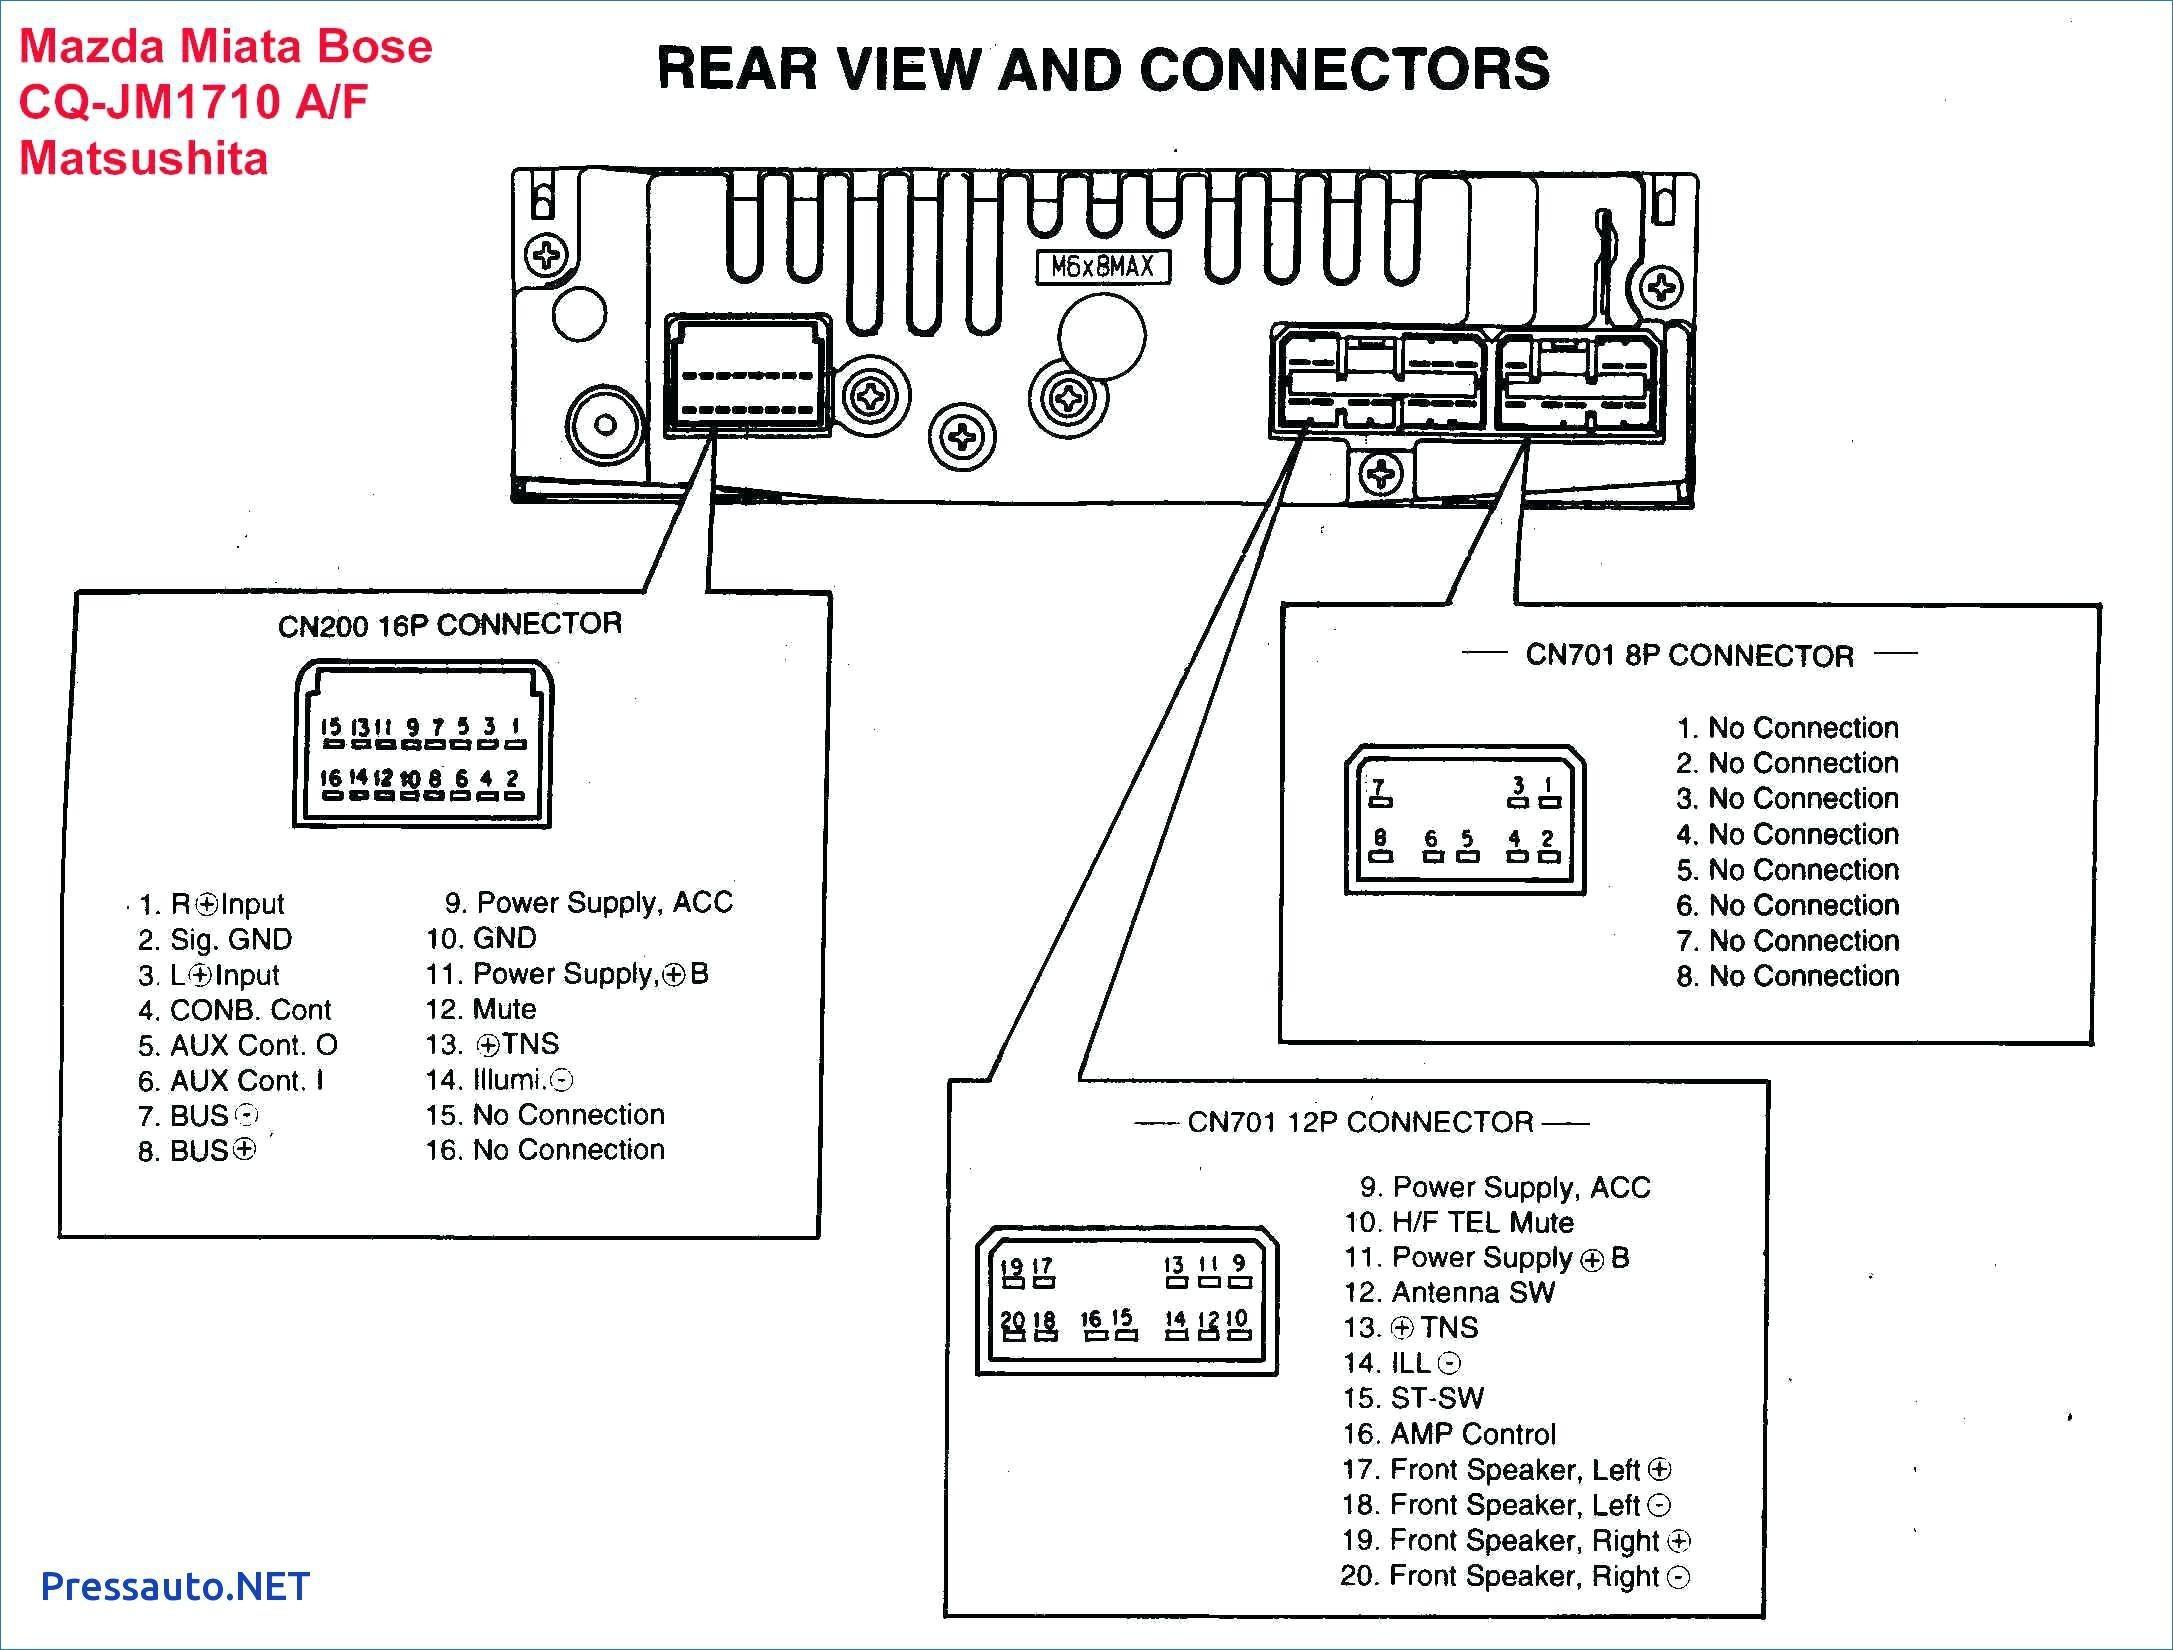 mazda bongo engine diagram 1999 mazda millenia wiring schematics rh detoxicrecenze com 1998 Mazda Millenia 1999 Mazda Millenia Interior